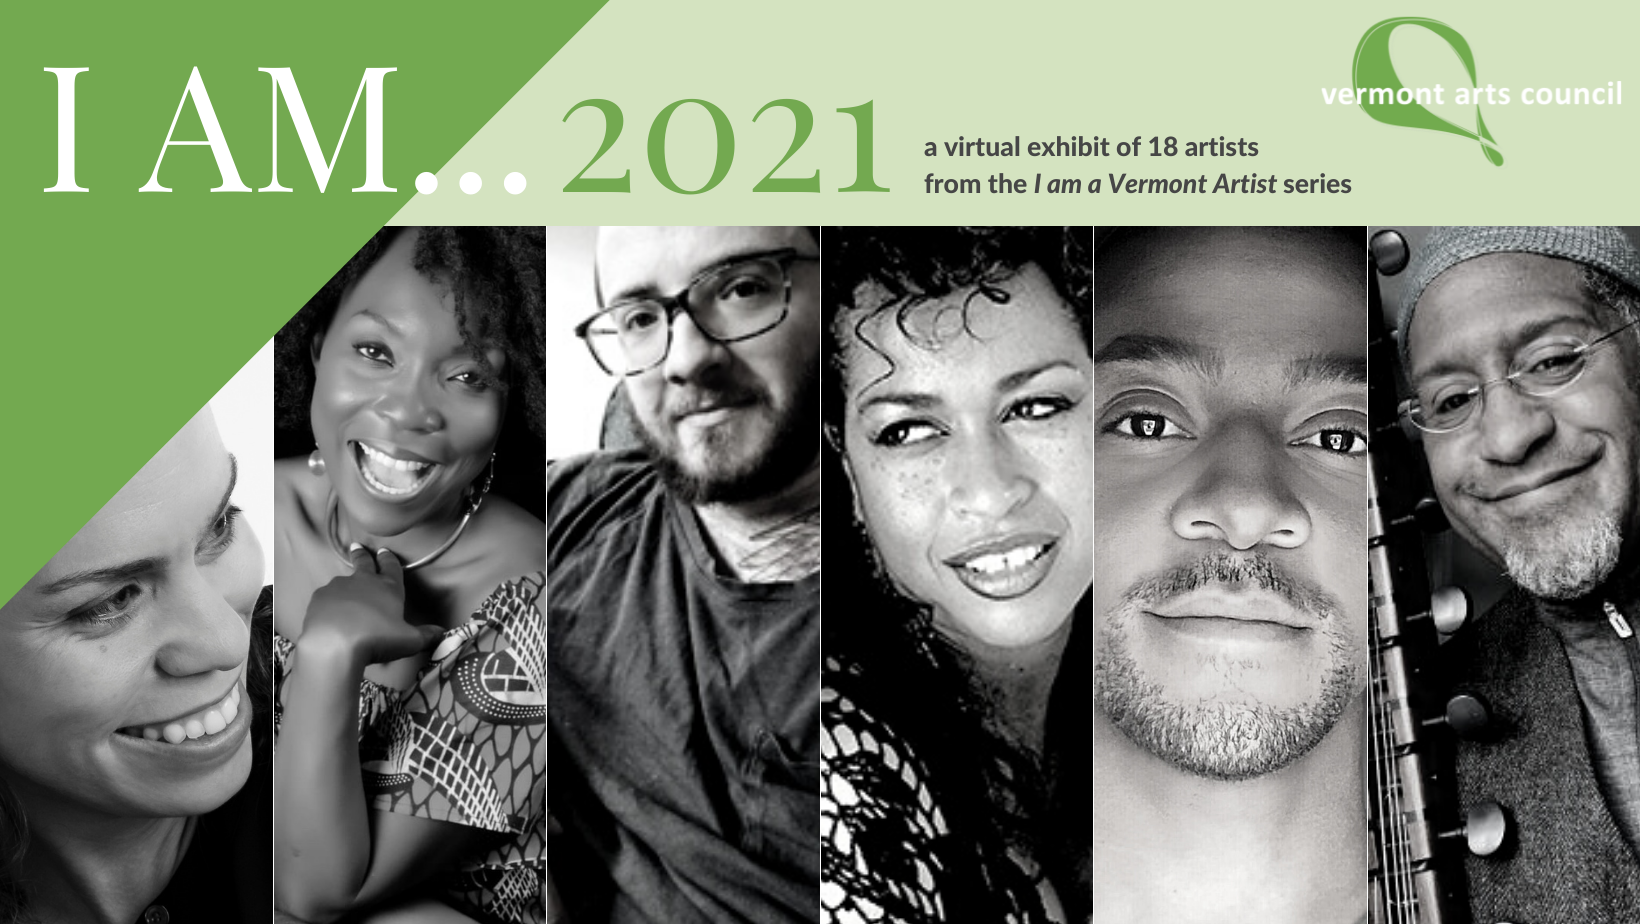 5 of 19 featured artists, from left to right: Jericho Parms, KeruBo Webster, Toby MacNutt, Samirah Evans, Shani Stoddard, John Hughes